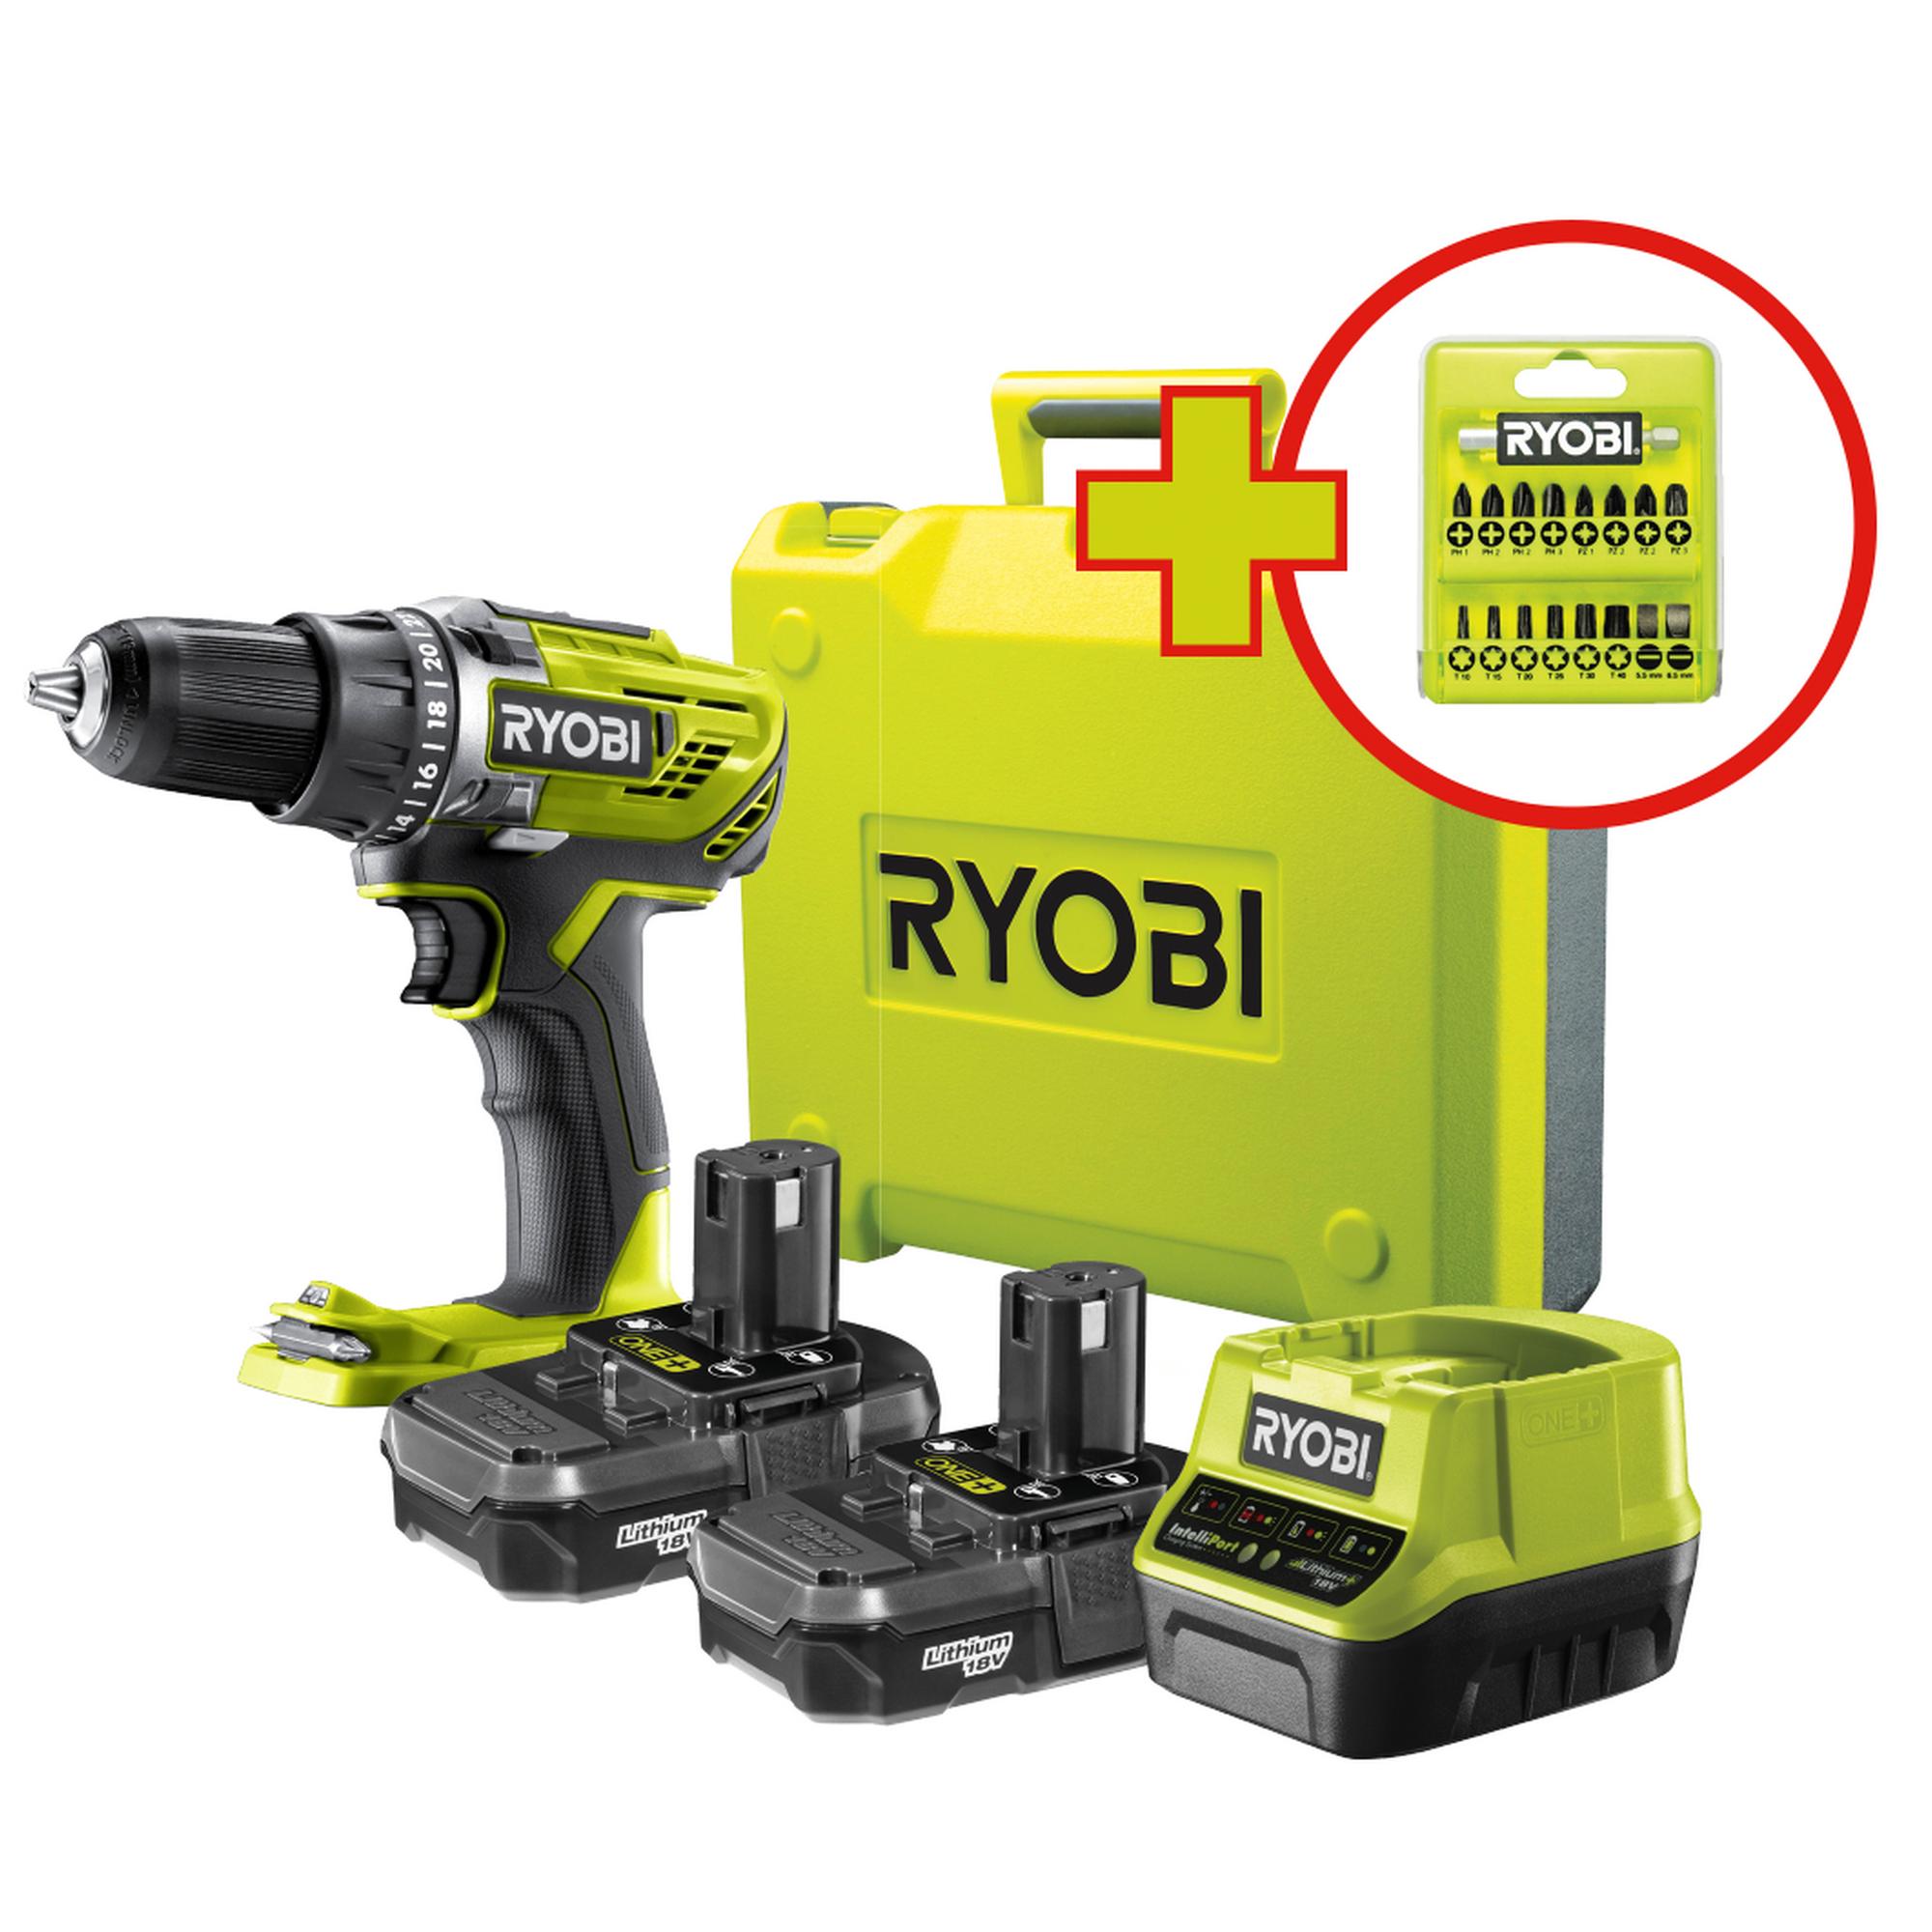 13 mm Ryobi 2-Gang Akku-Bohrschrauber 18 V R18DD3-0 Akku und Ladegerät o